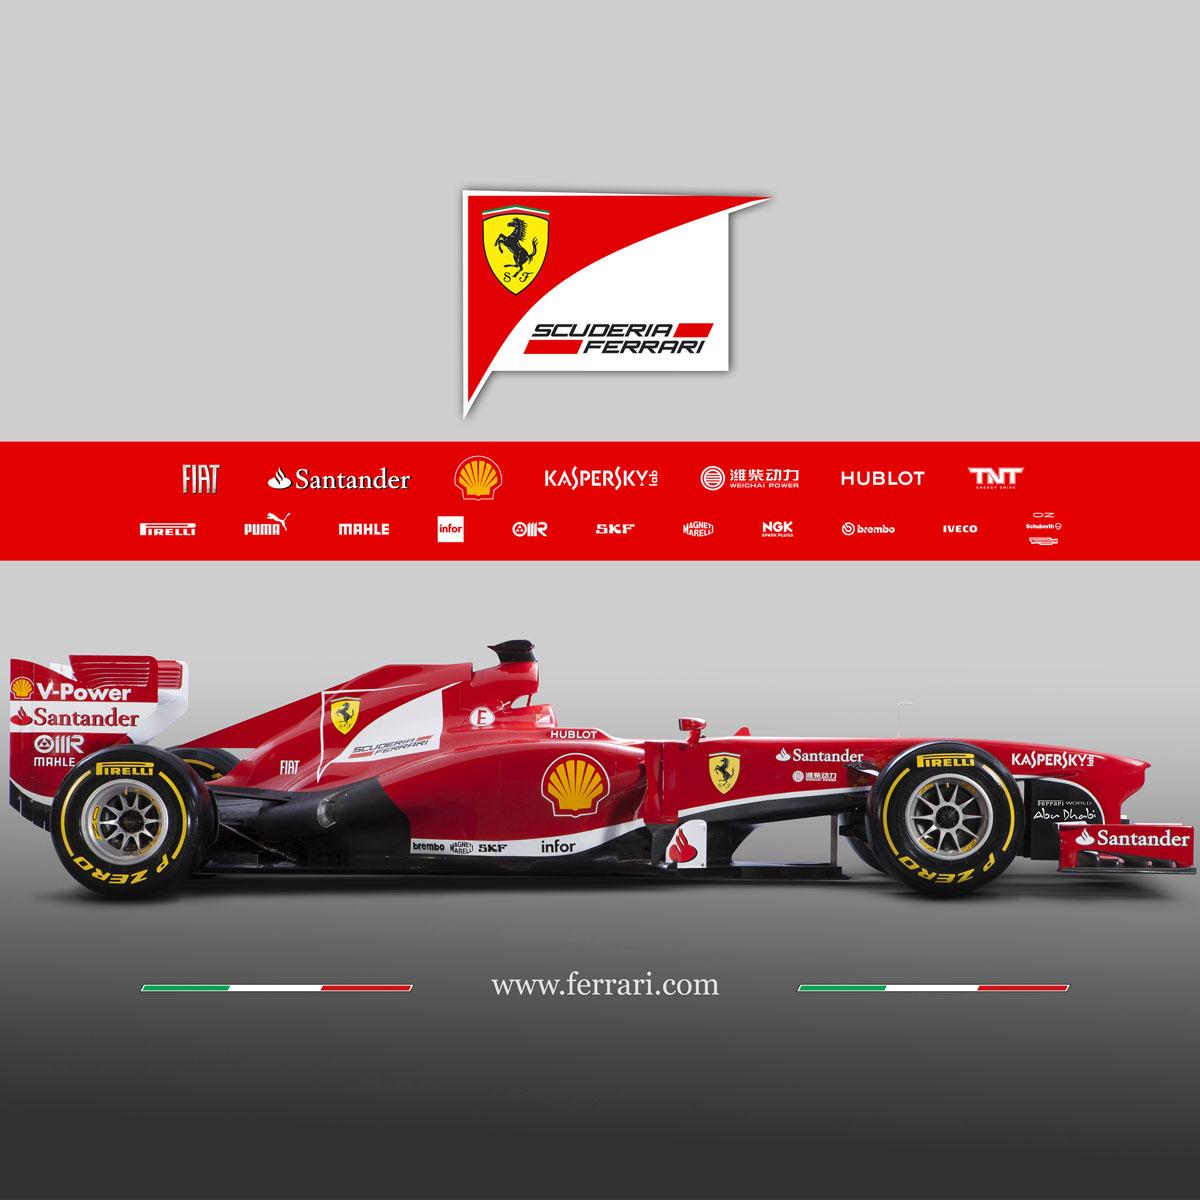 La Cote des Montres : Photo - La Scuderia Ferrari à l'heure Hublot